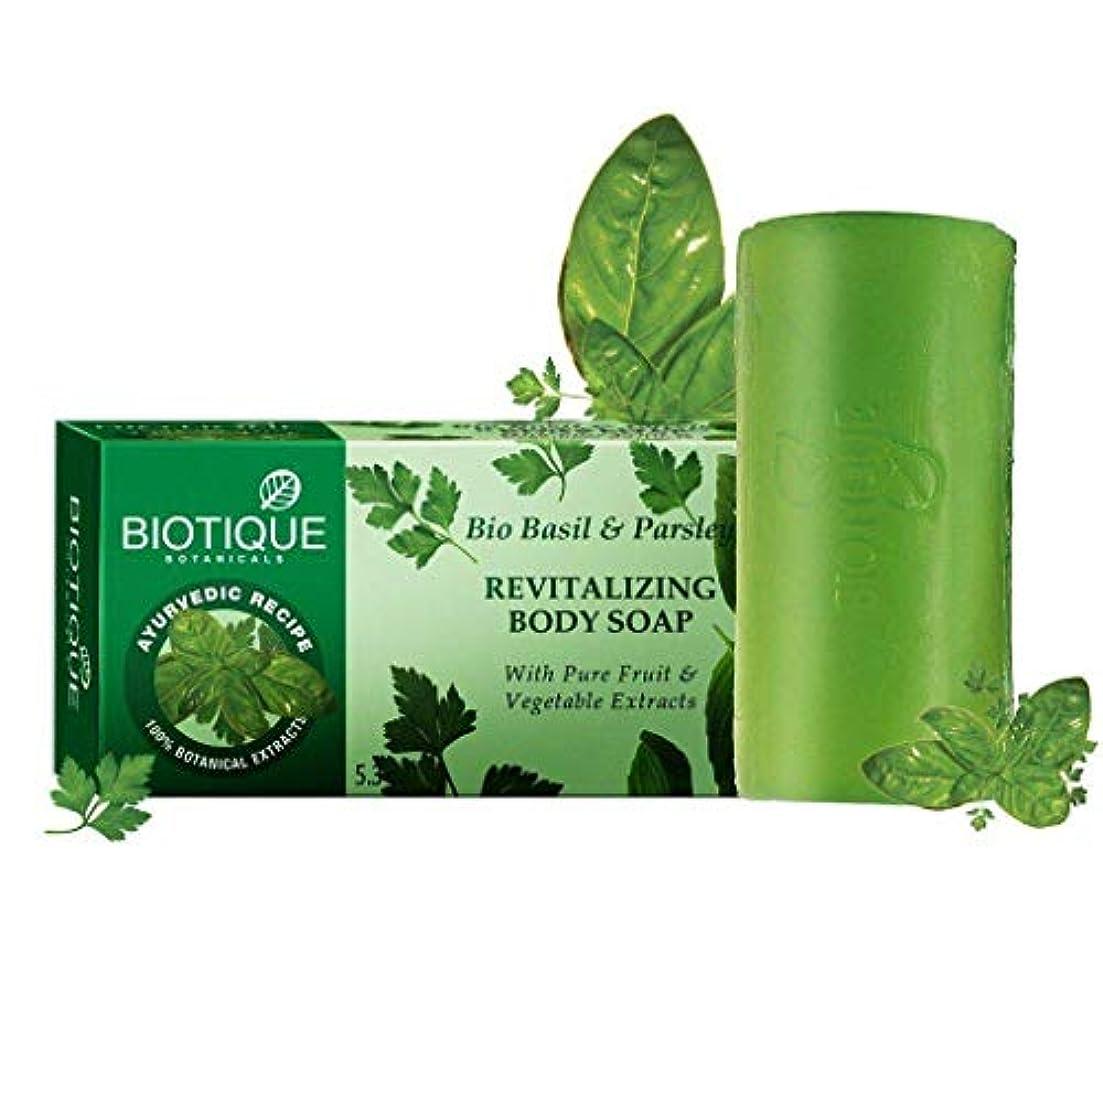 Biotique Bio Basil And Parsley Revitalizing Body Soap 150g (Pack of 2) Biotiqueバイオバジルとパセリの活性化ボディソープ